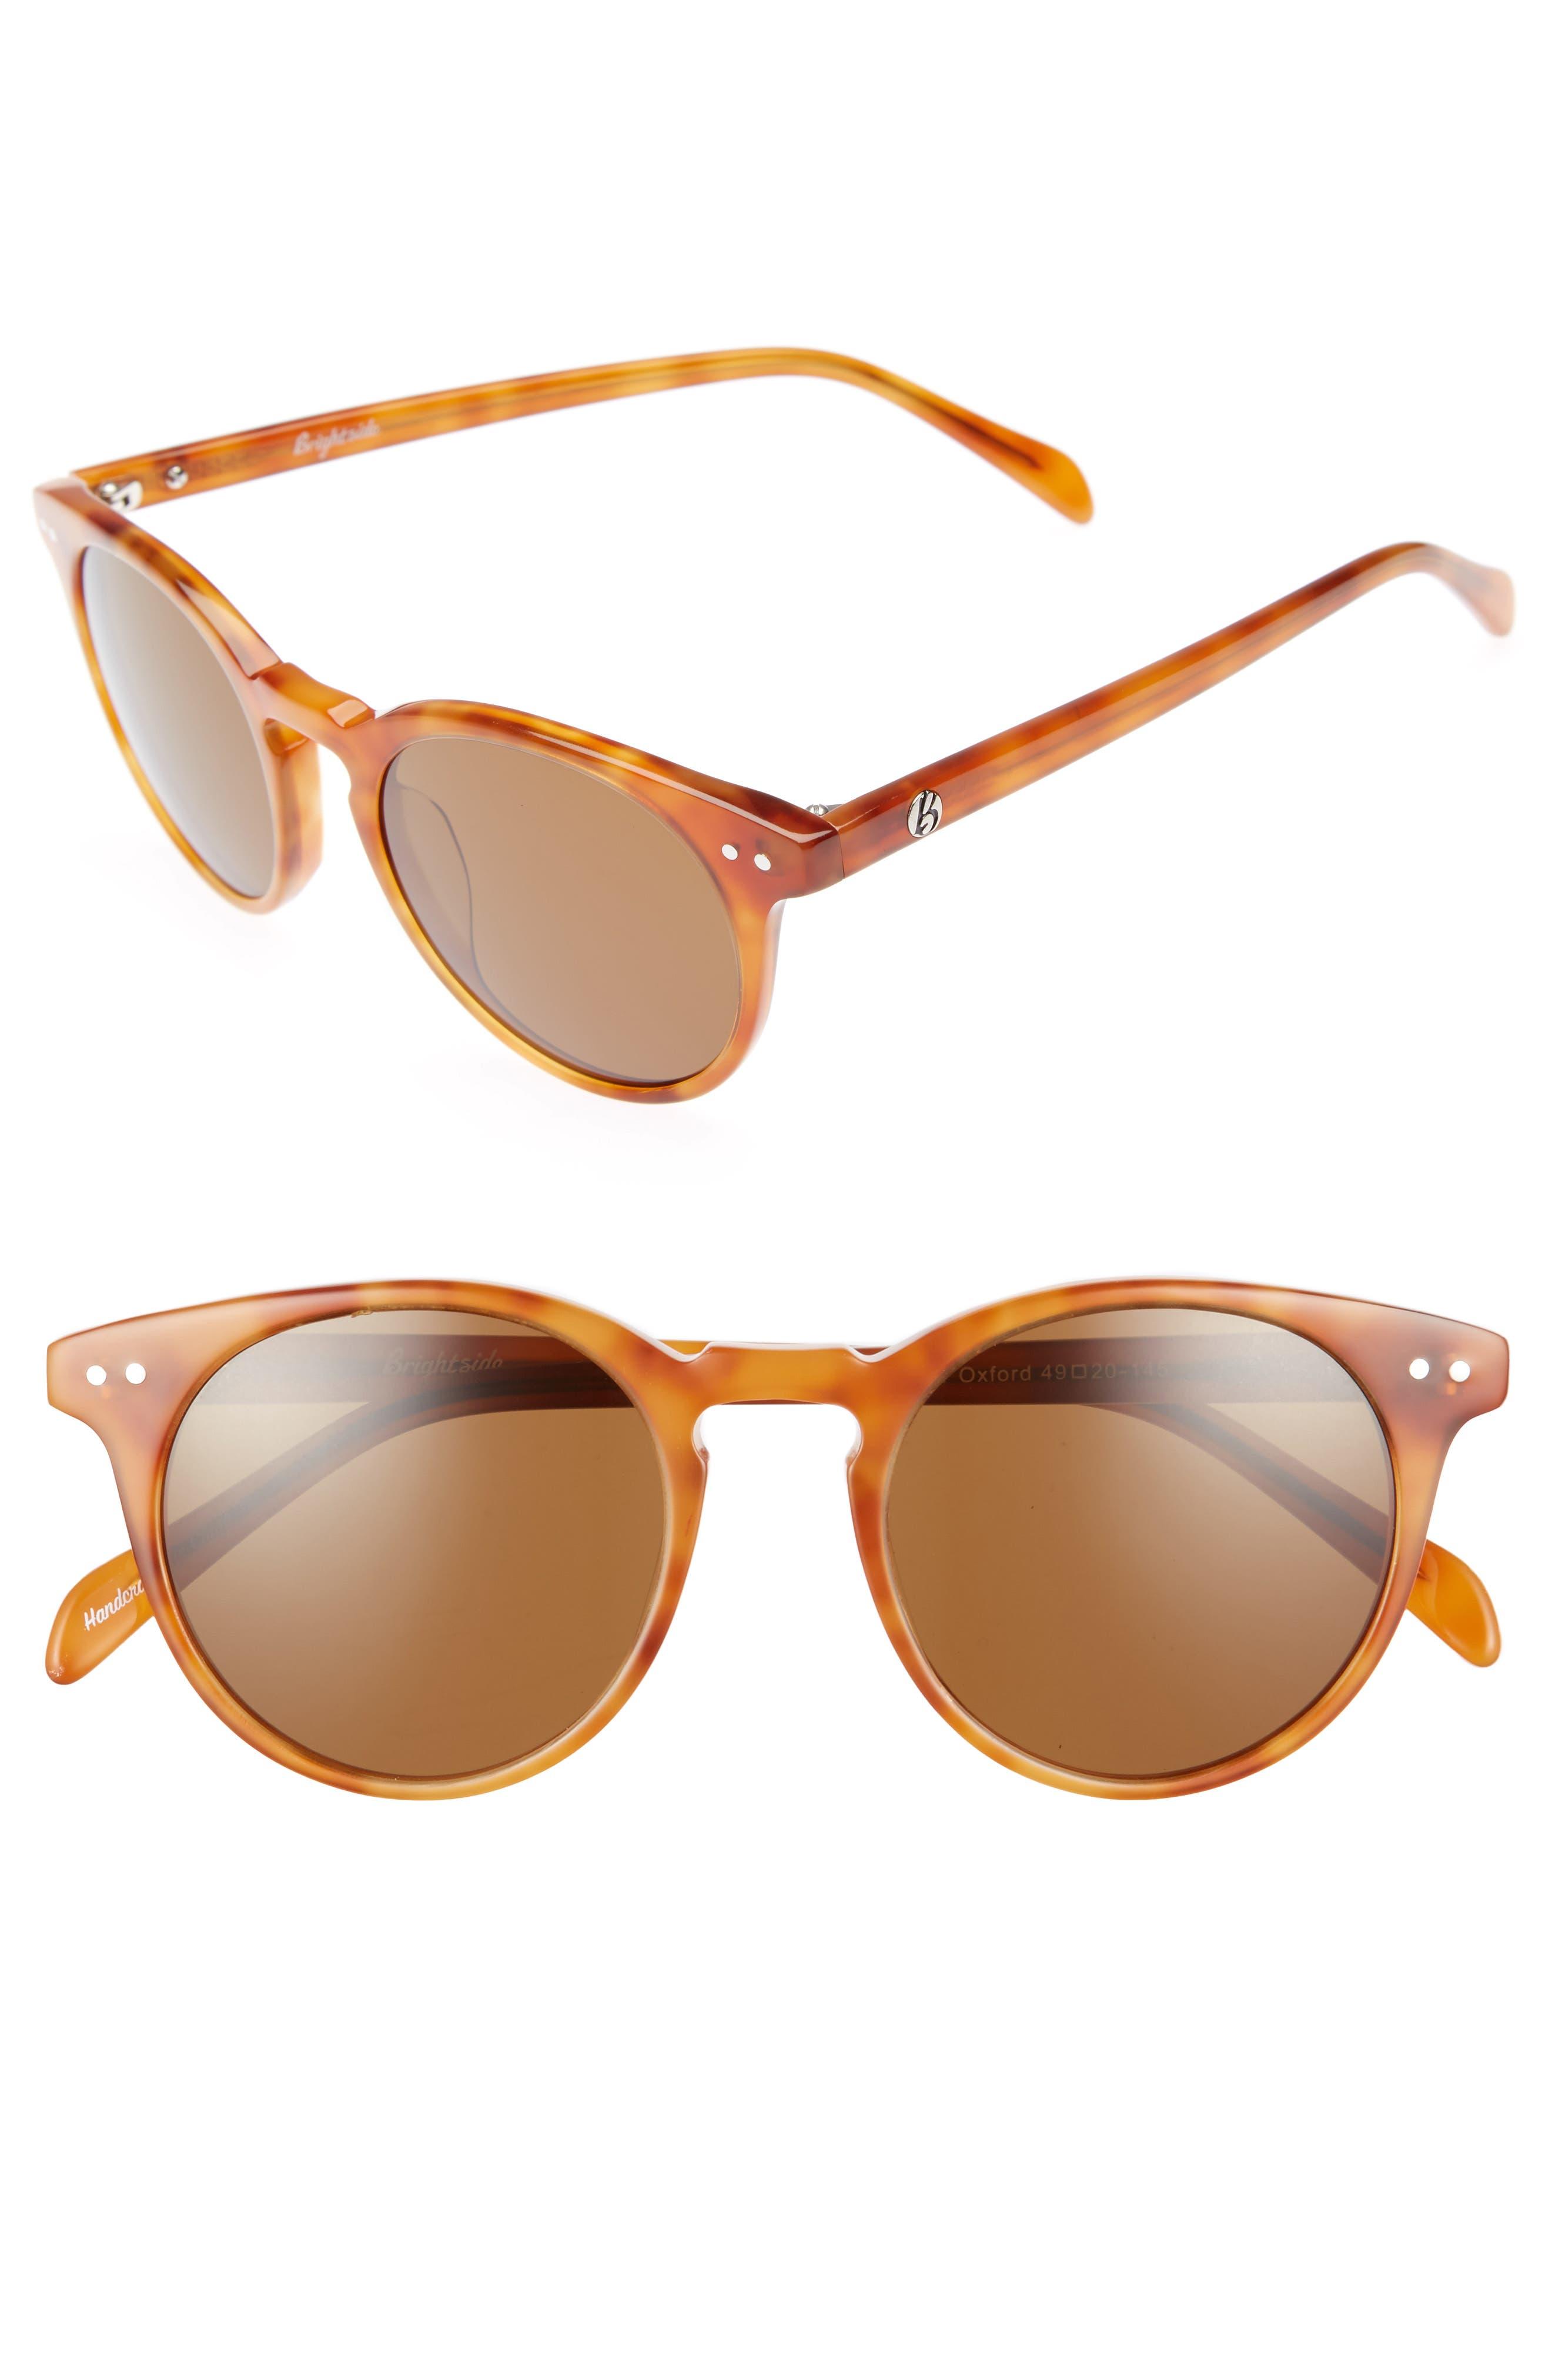 Main Image - Brightside Oxford 49mm Sunglasses